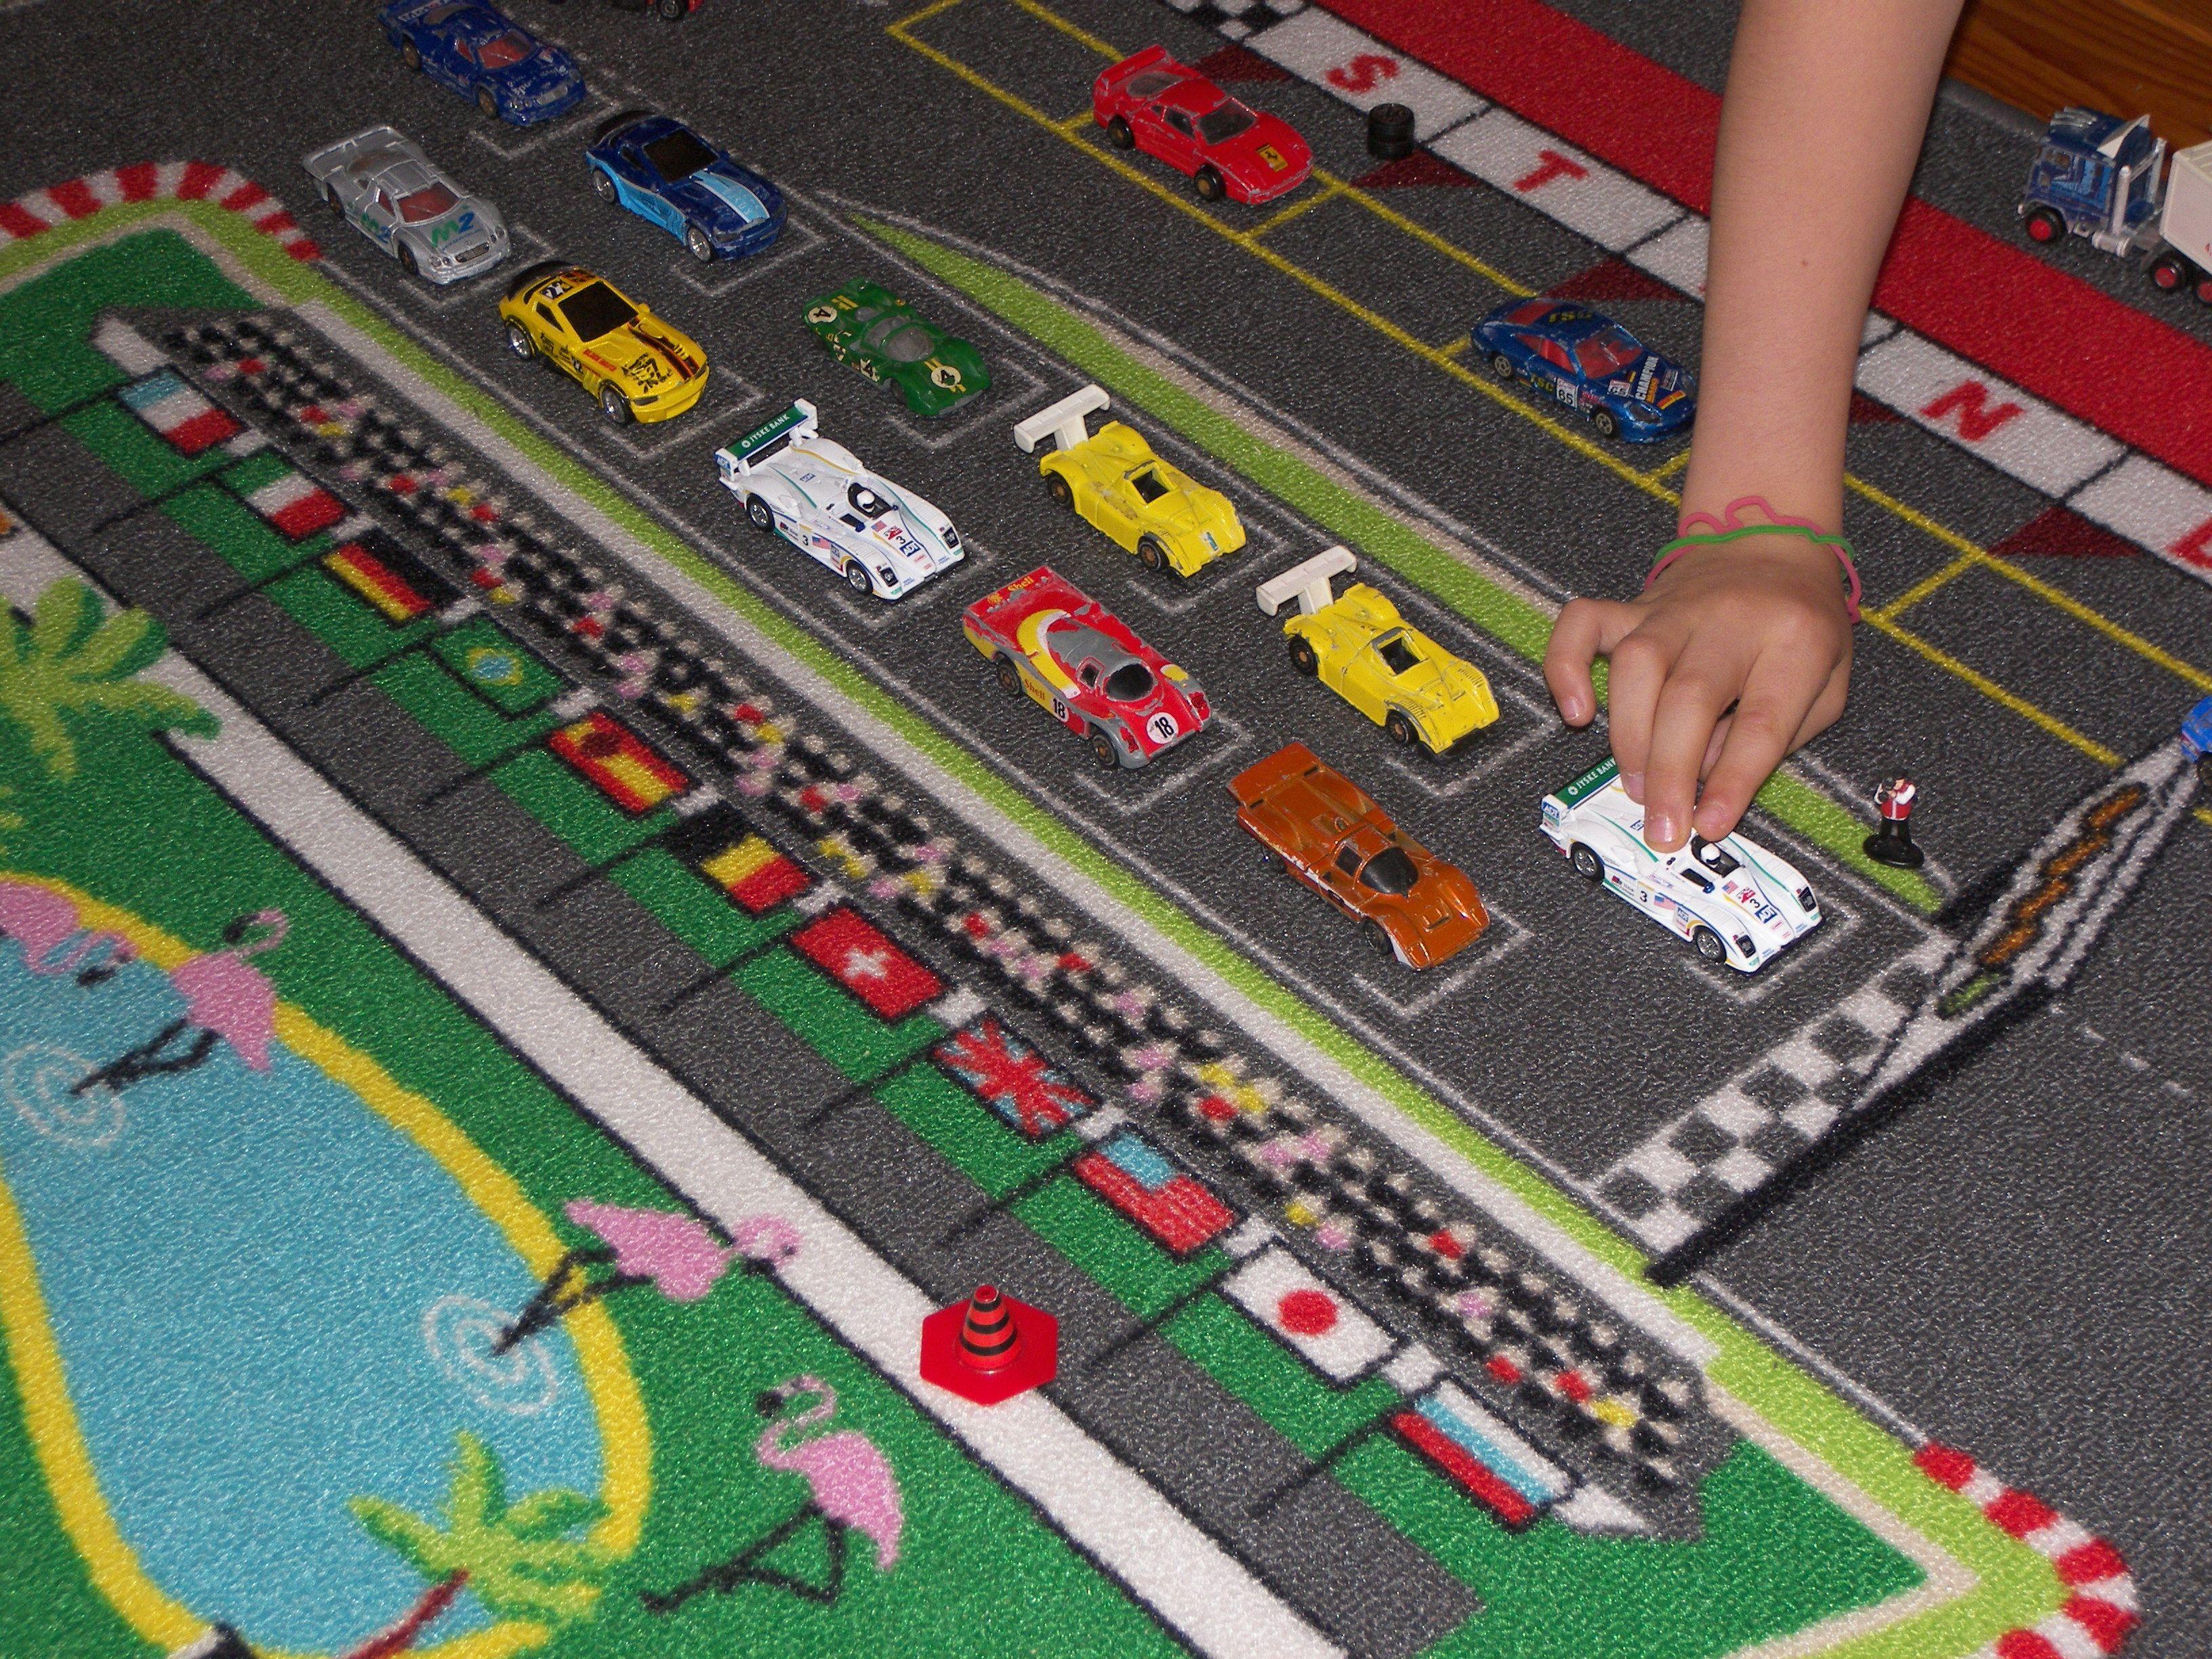 course de petite voiture sur un tapis de formule 1 tapisroute tapispetitevoiture tapitom. Black Bedroom Furniture Sets. Home Design Ideas